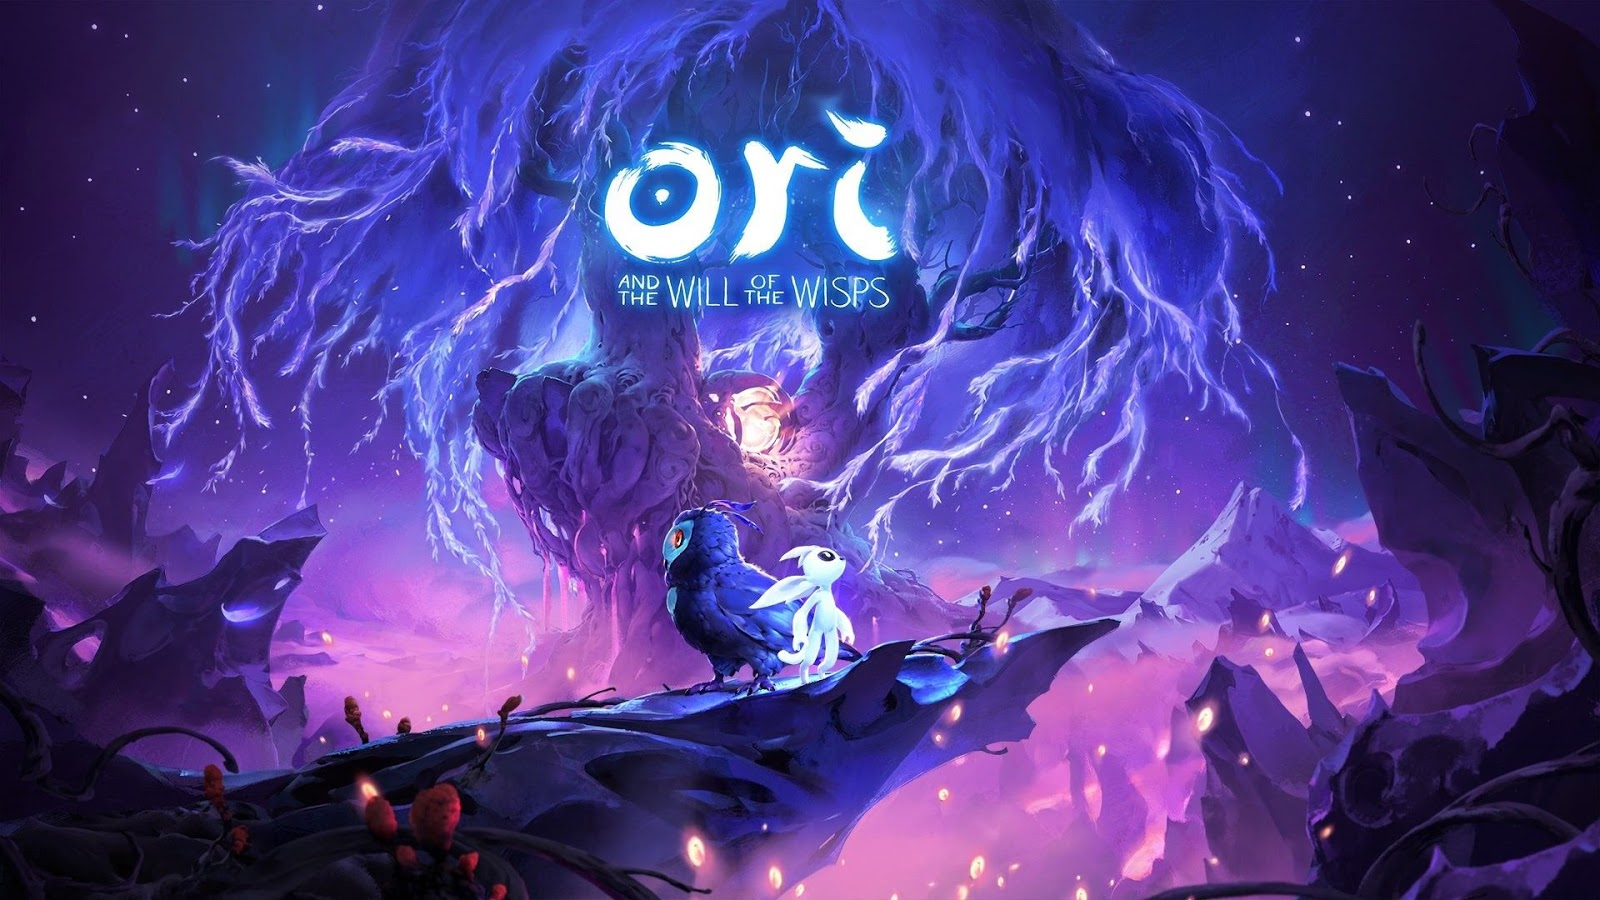 Link Tải Game Ori and the Will of the Wisps Miễn Phí Thành Công